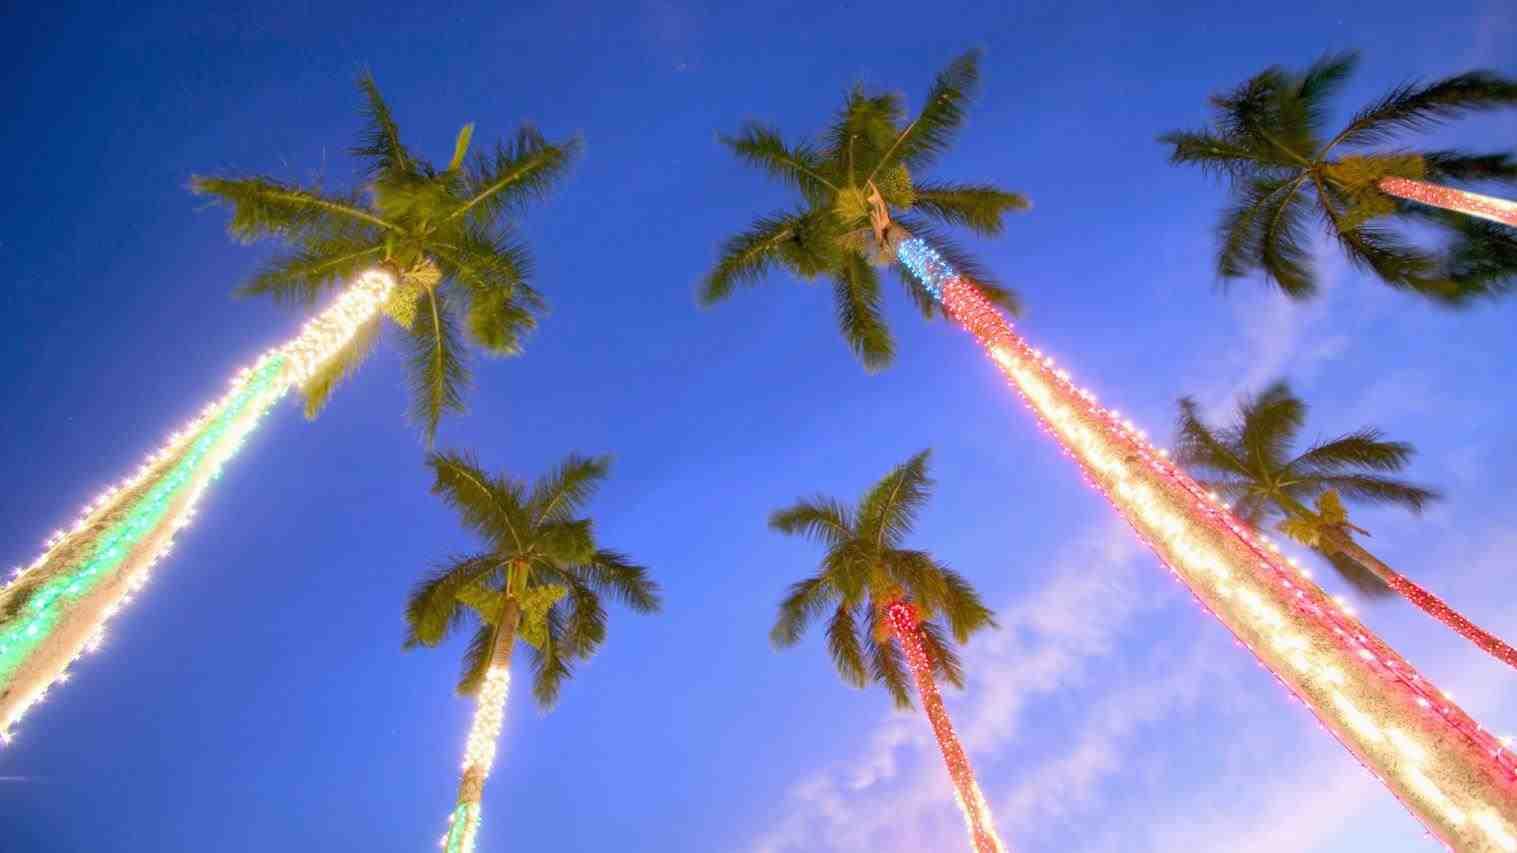 Christmas Lights Palm Tree